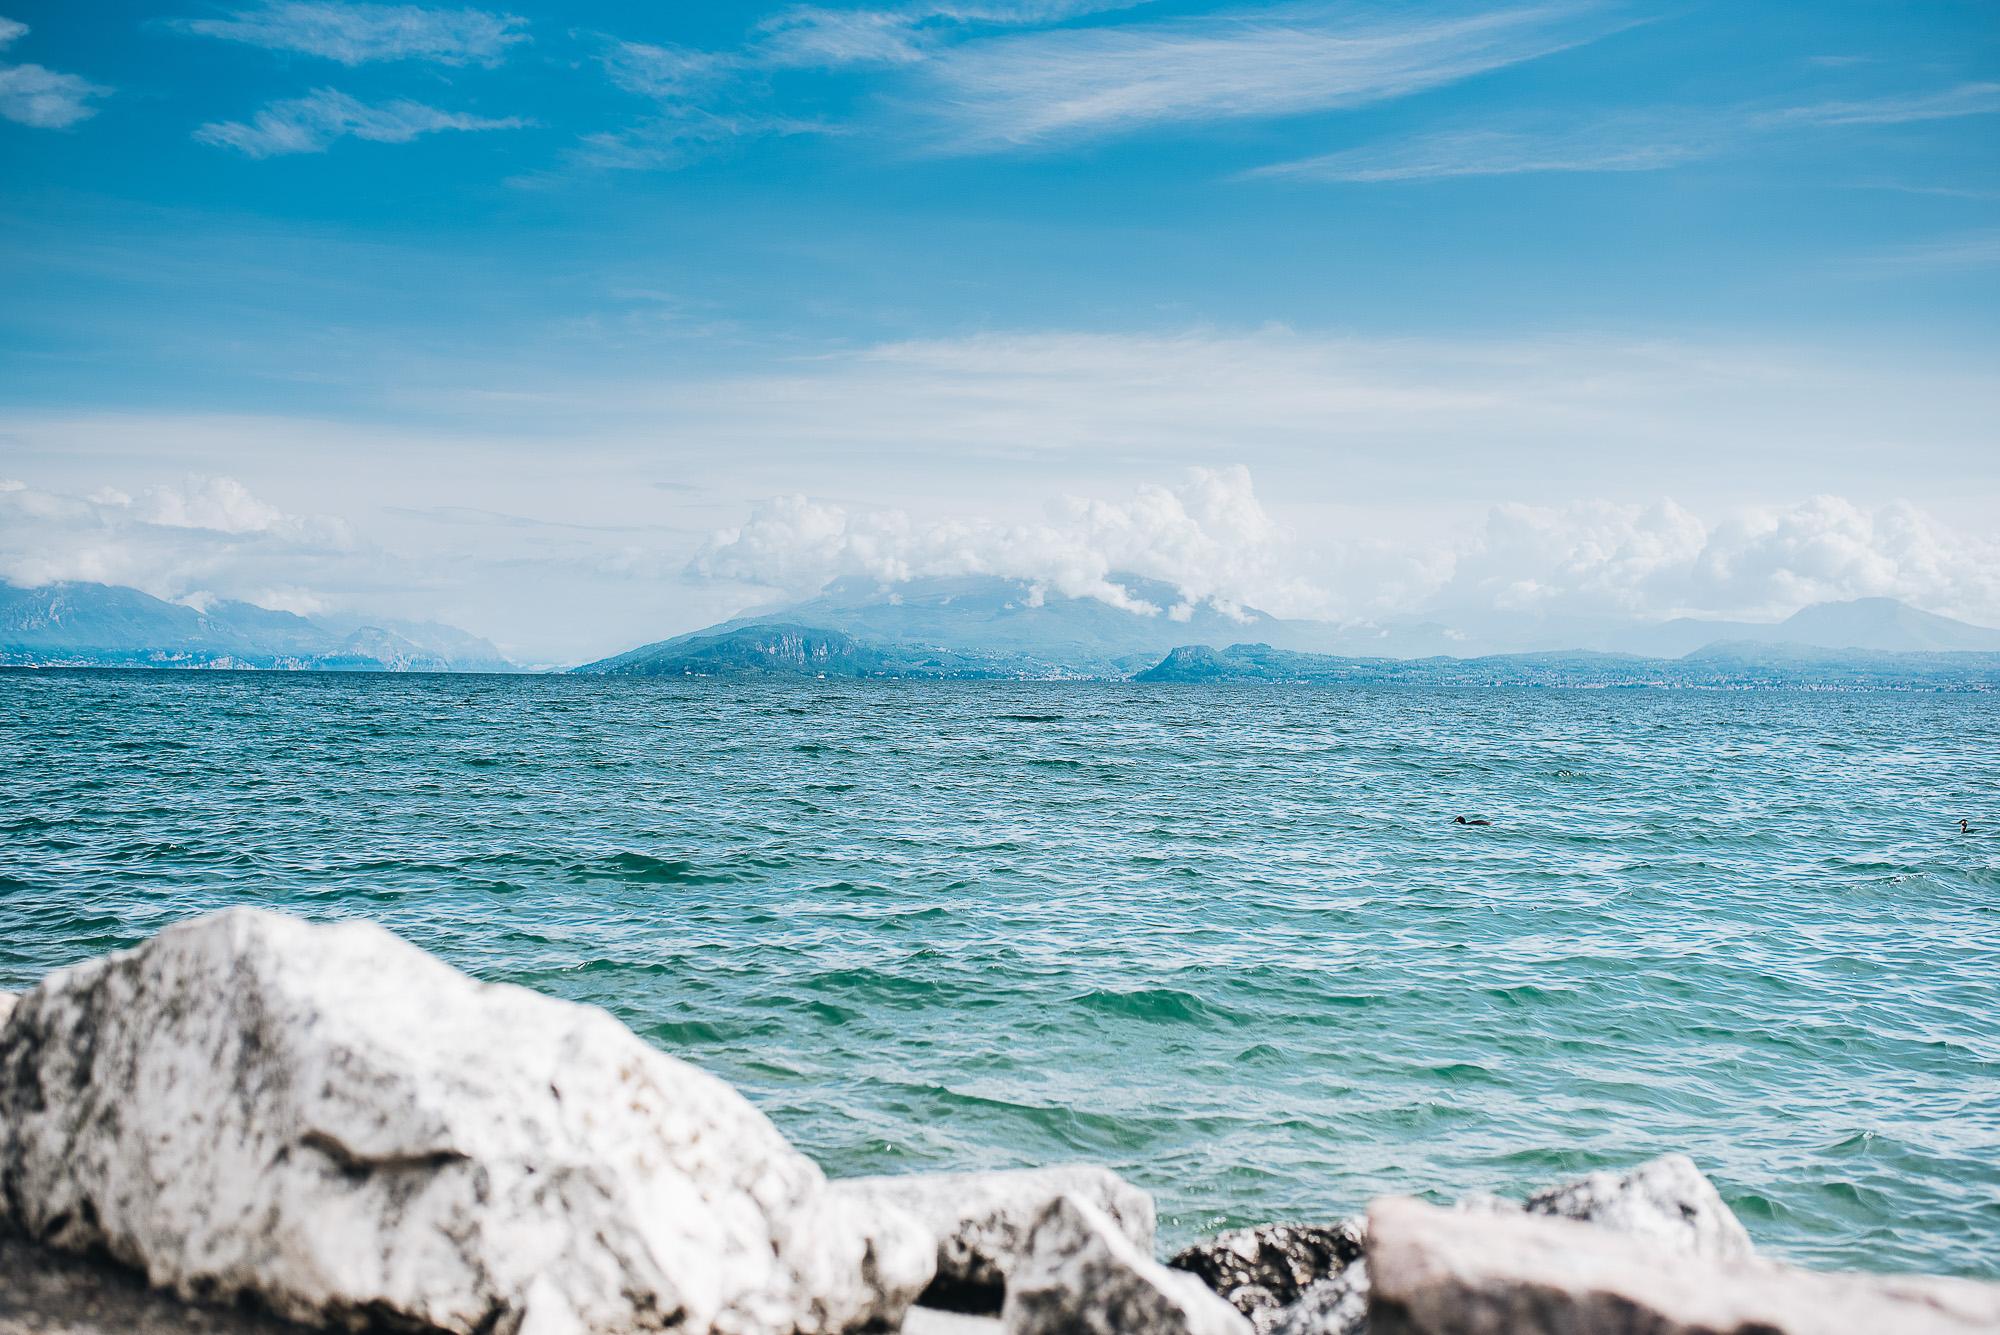 OurBeautifulAdventure-LakeGarda-Italy-Blog-0772.jpg